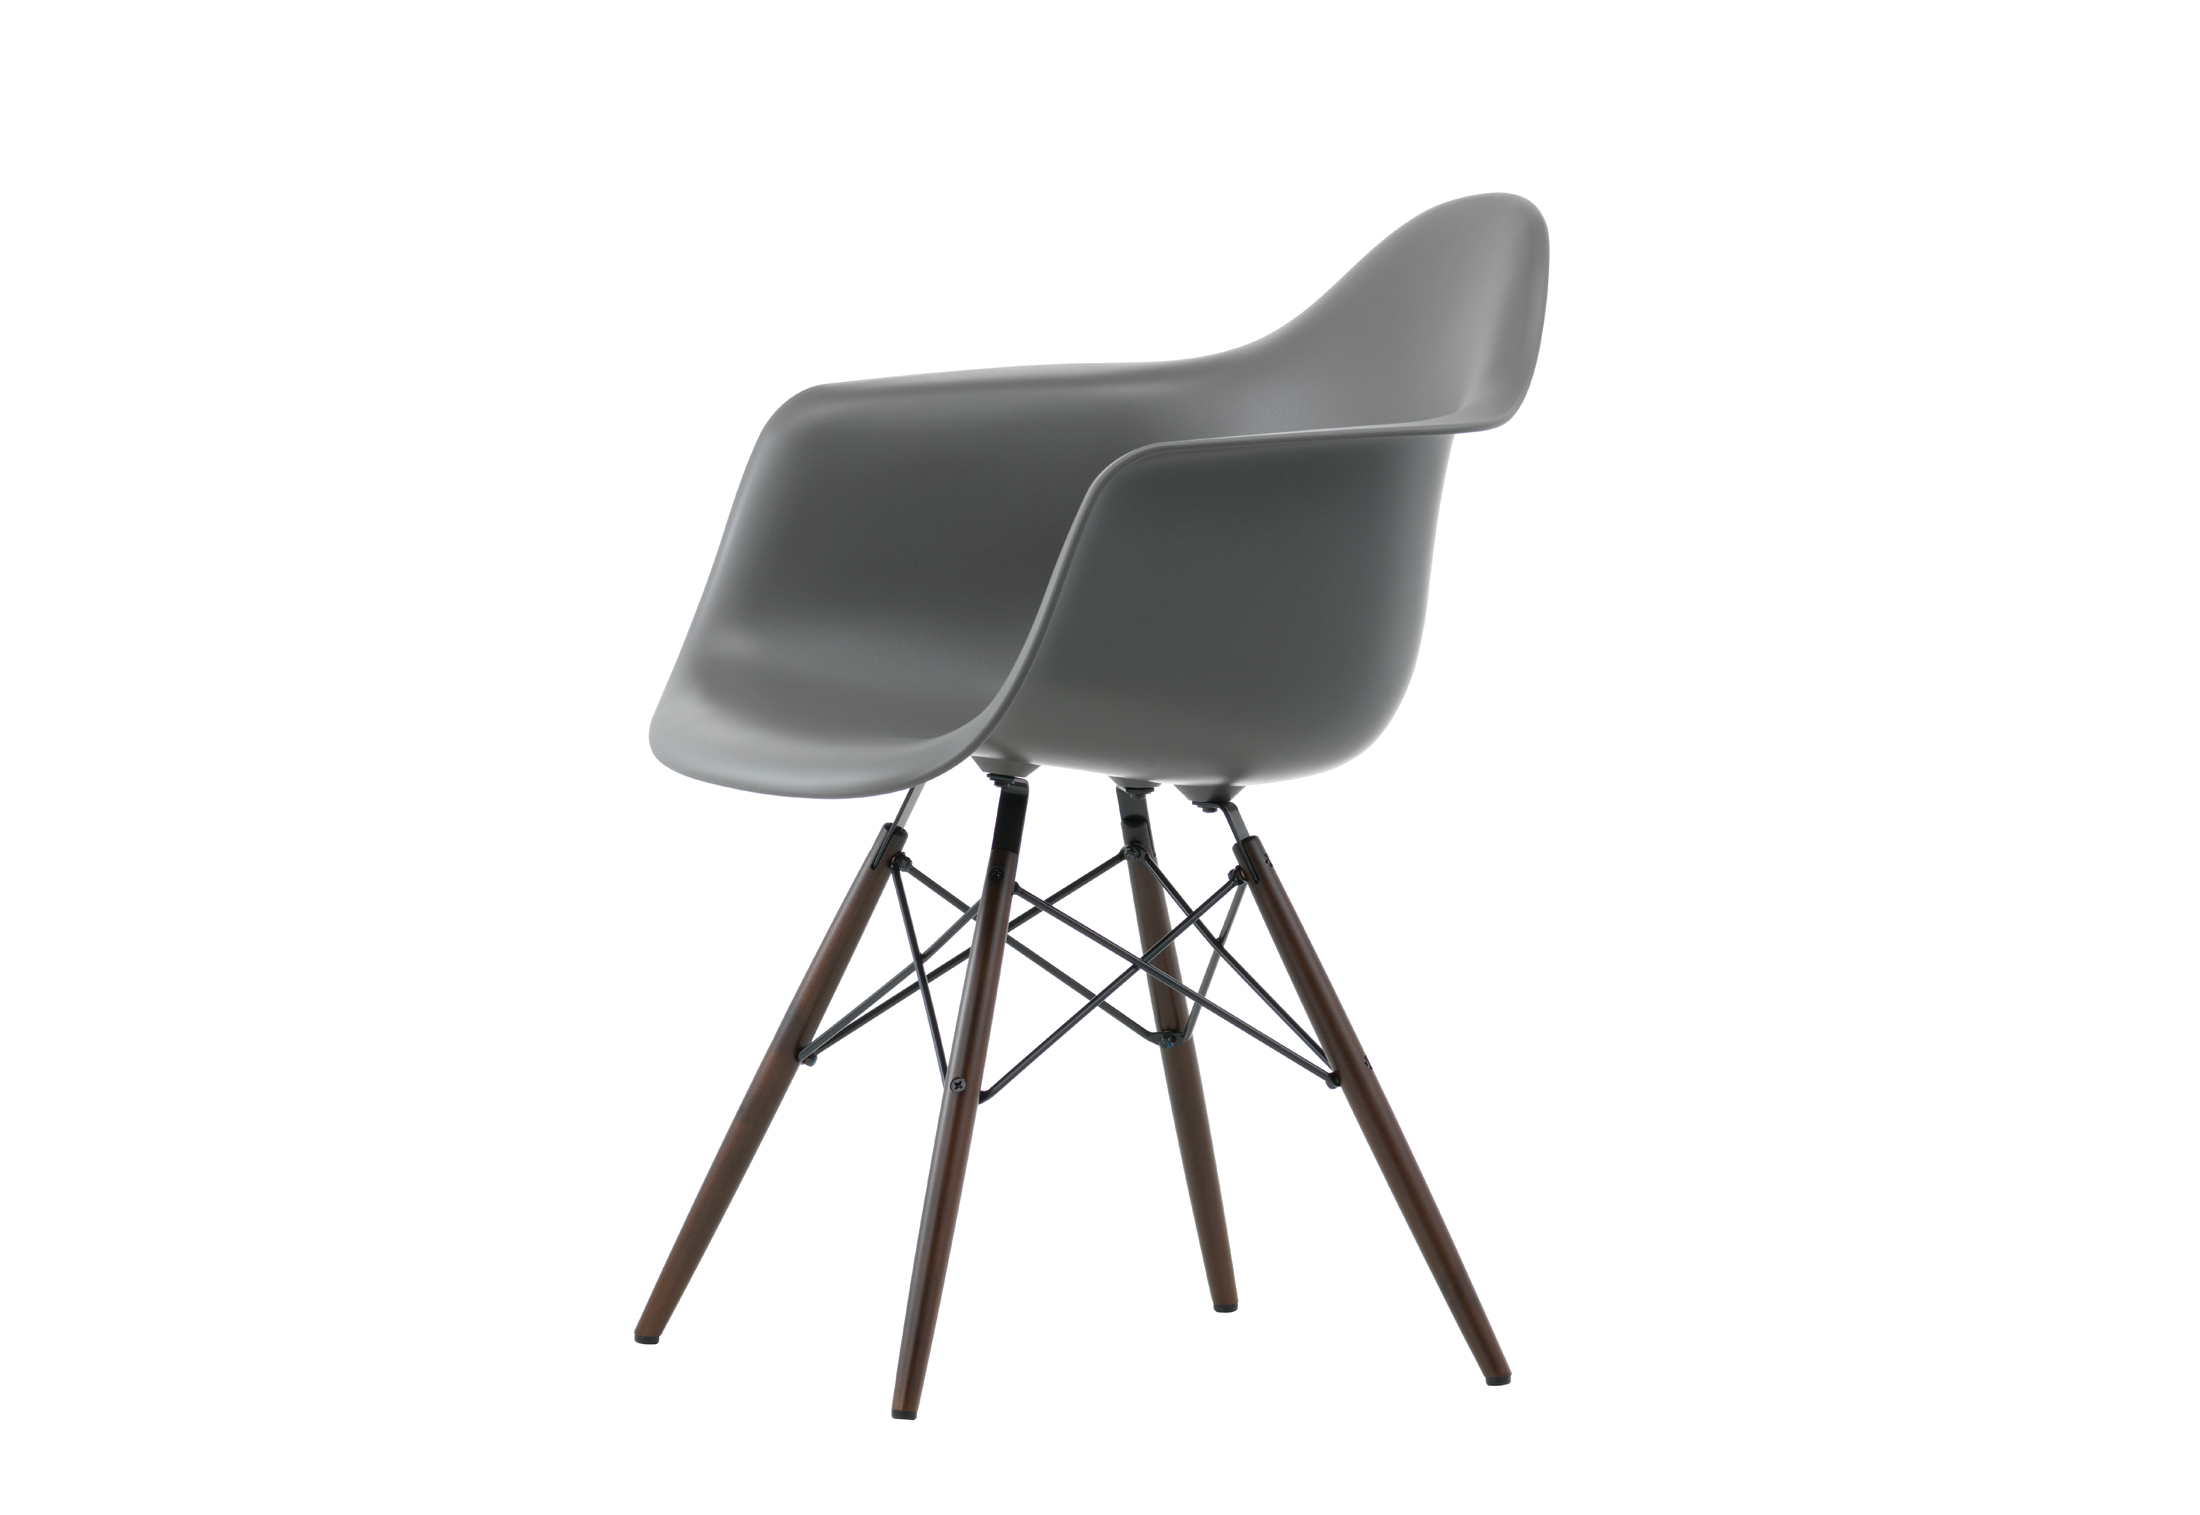 Eames Plastic Armchair DAR by Vitra | STYLEPARK